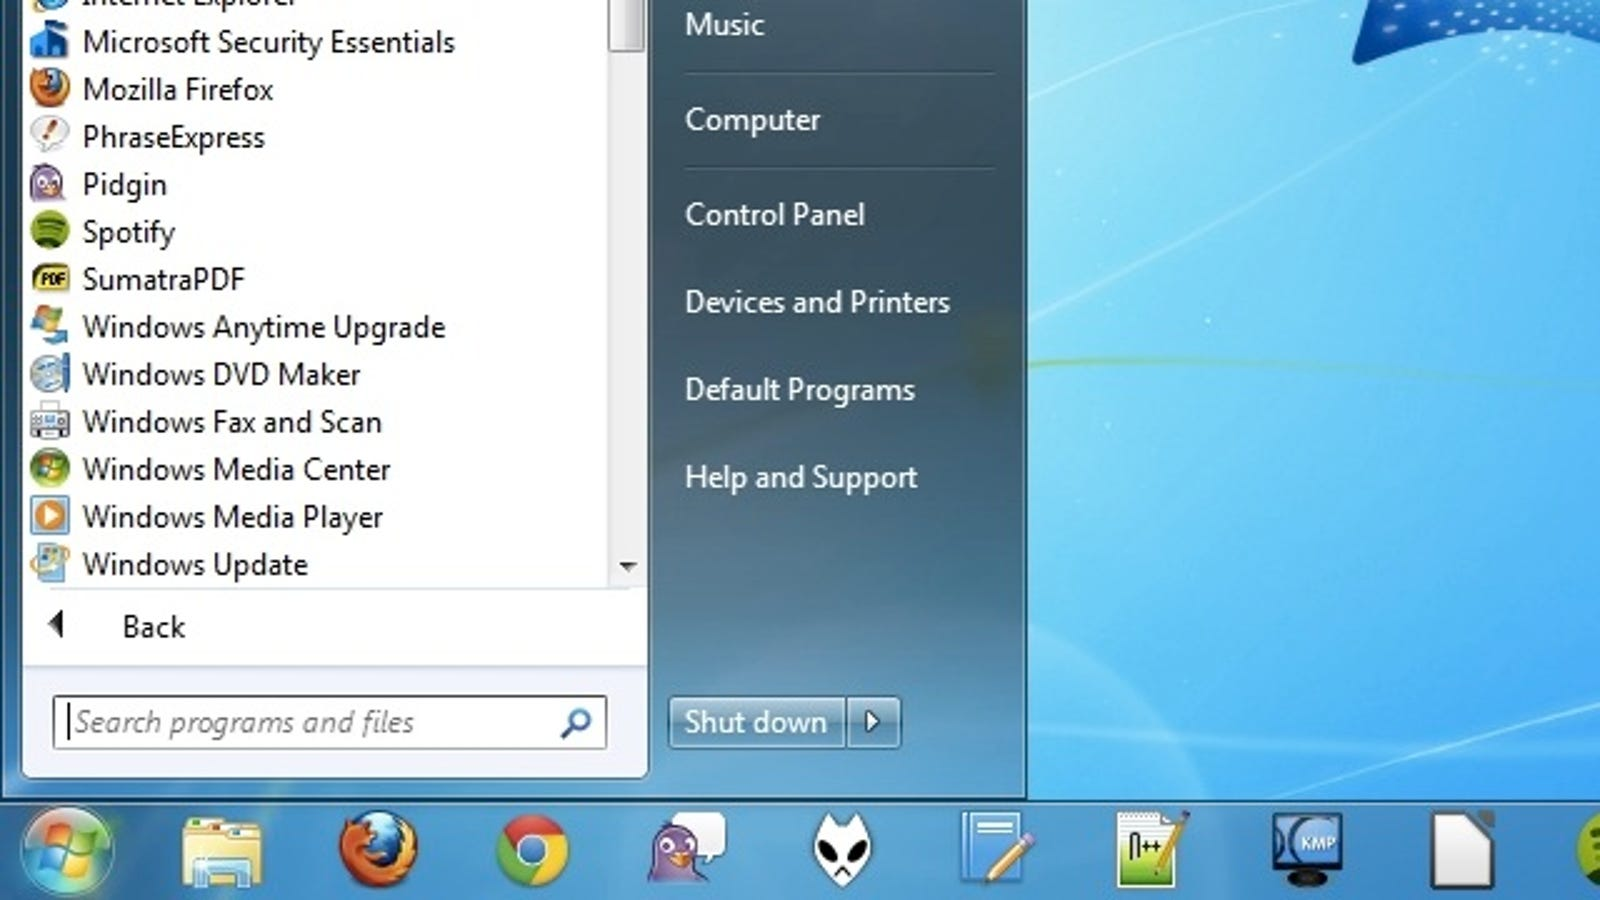 Switch Your Windows 8 Start Menu Back to Windows 7 Style